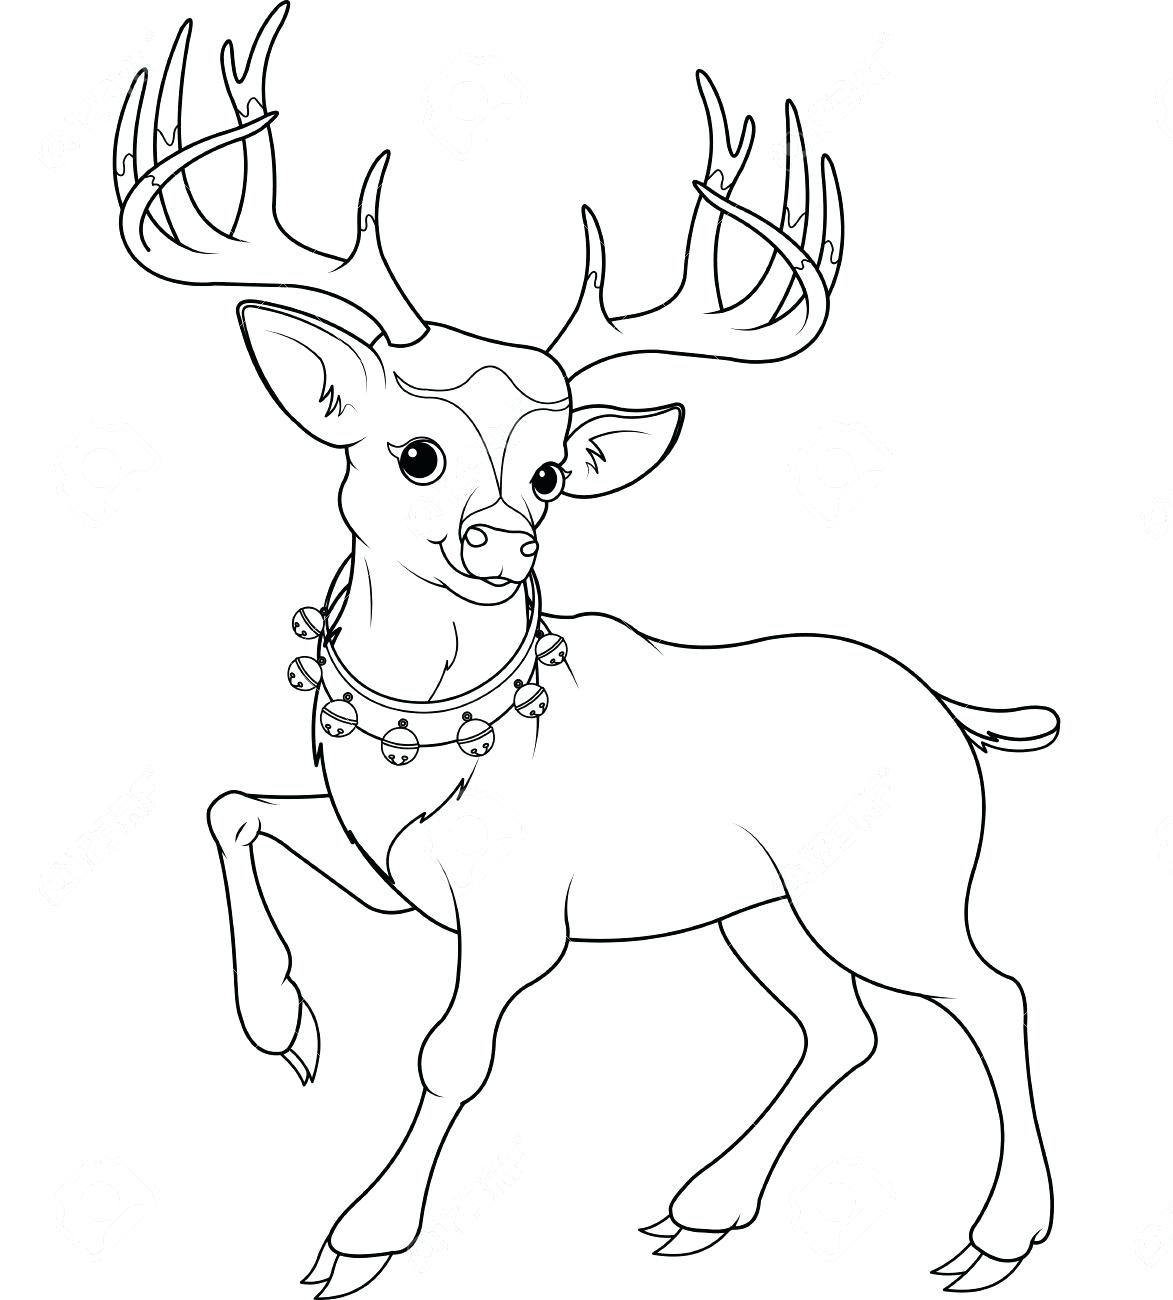 Cute Deer Drawing at GetDrawings.com | Free for personal use Cute ...